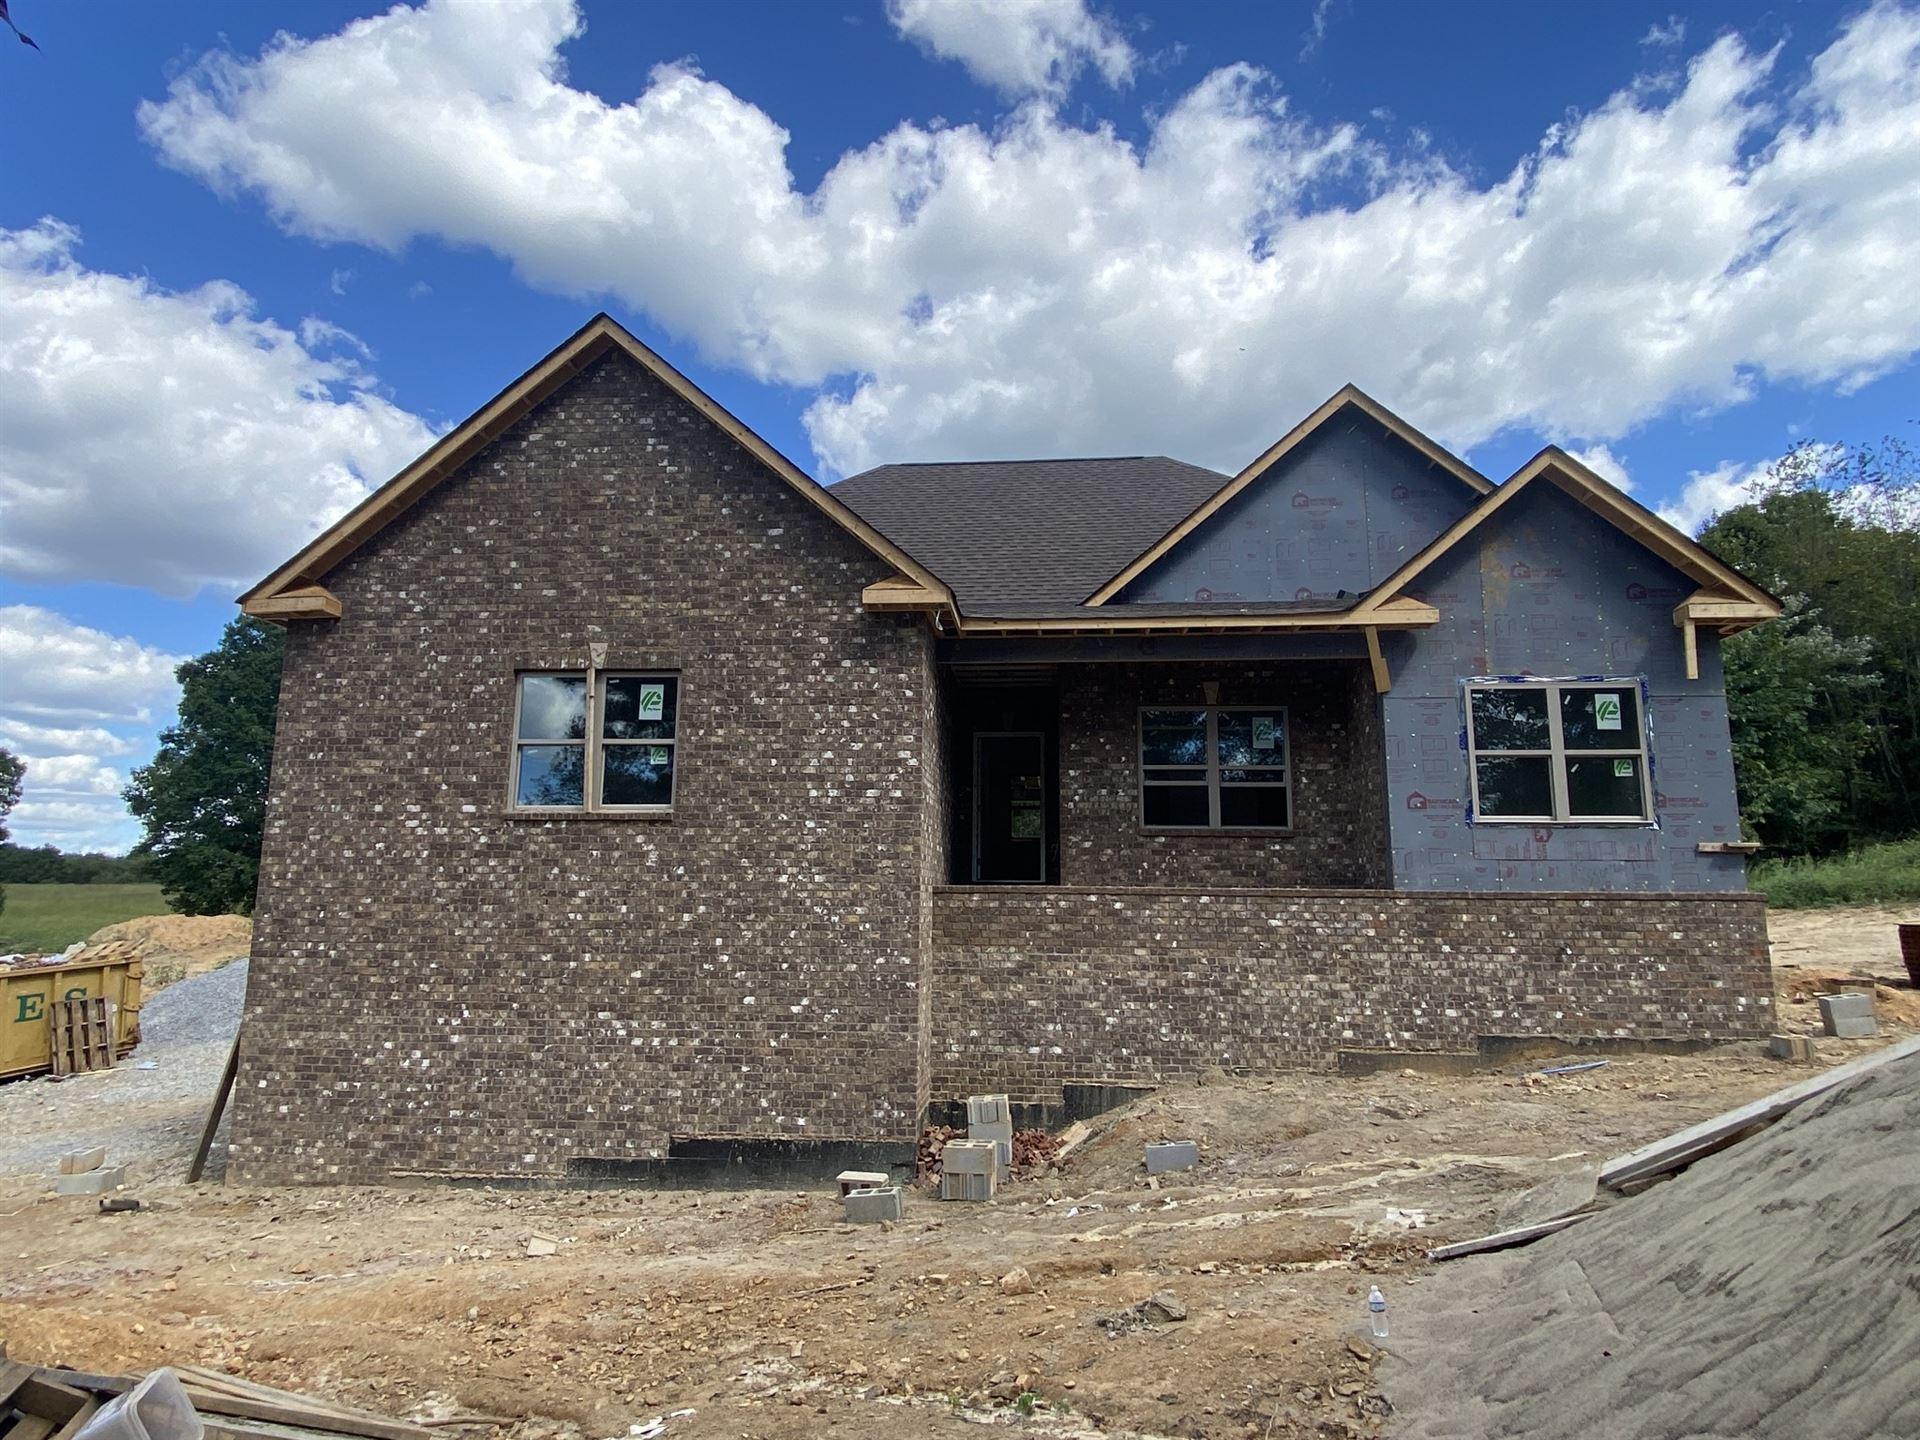 Photo of 2731 W County Farm Rd, Springfield, TN 37172 (MLS # 2293134)